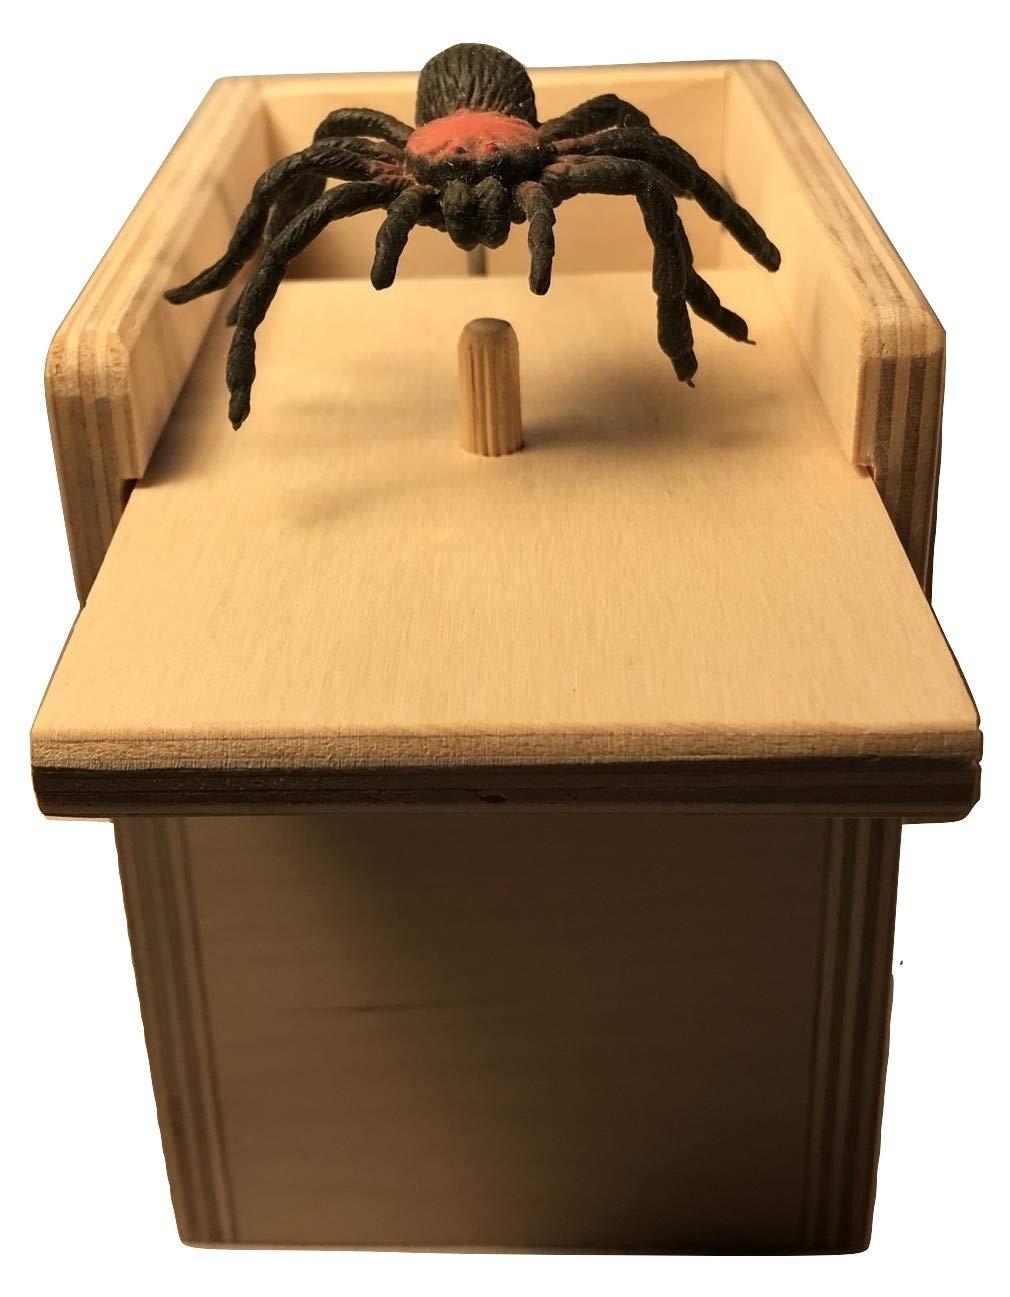 Saving Shepherd Mouse & Spider Surprise Box ~ 2 USA Handmade Fun Prank Gag Gifts by Saving Shepherd (Image #4)